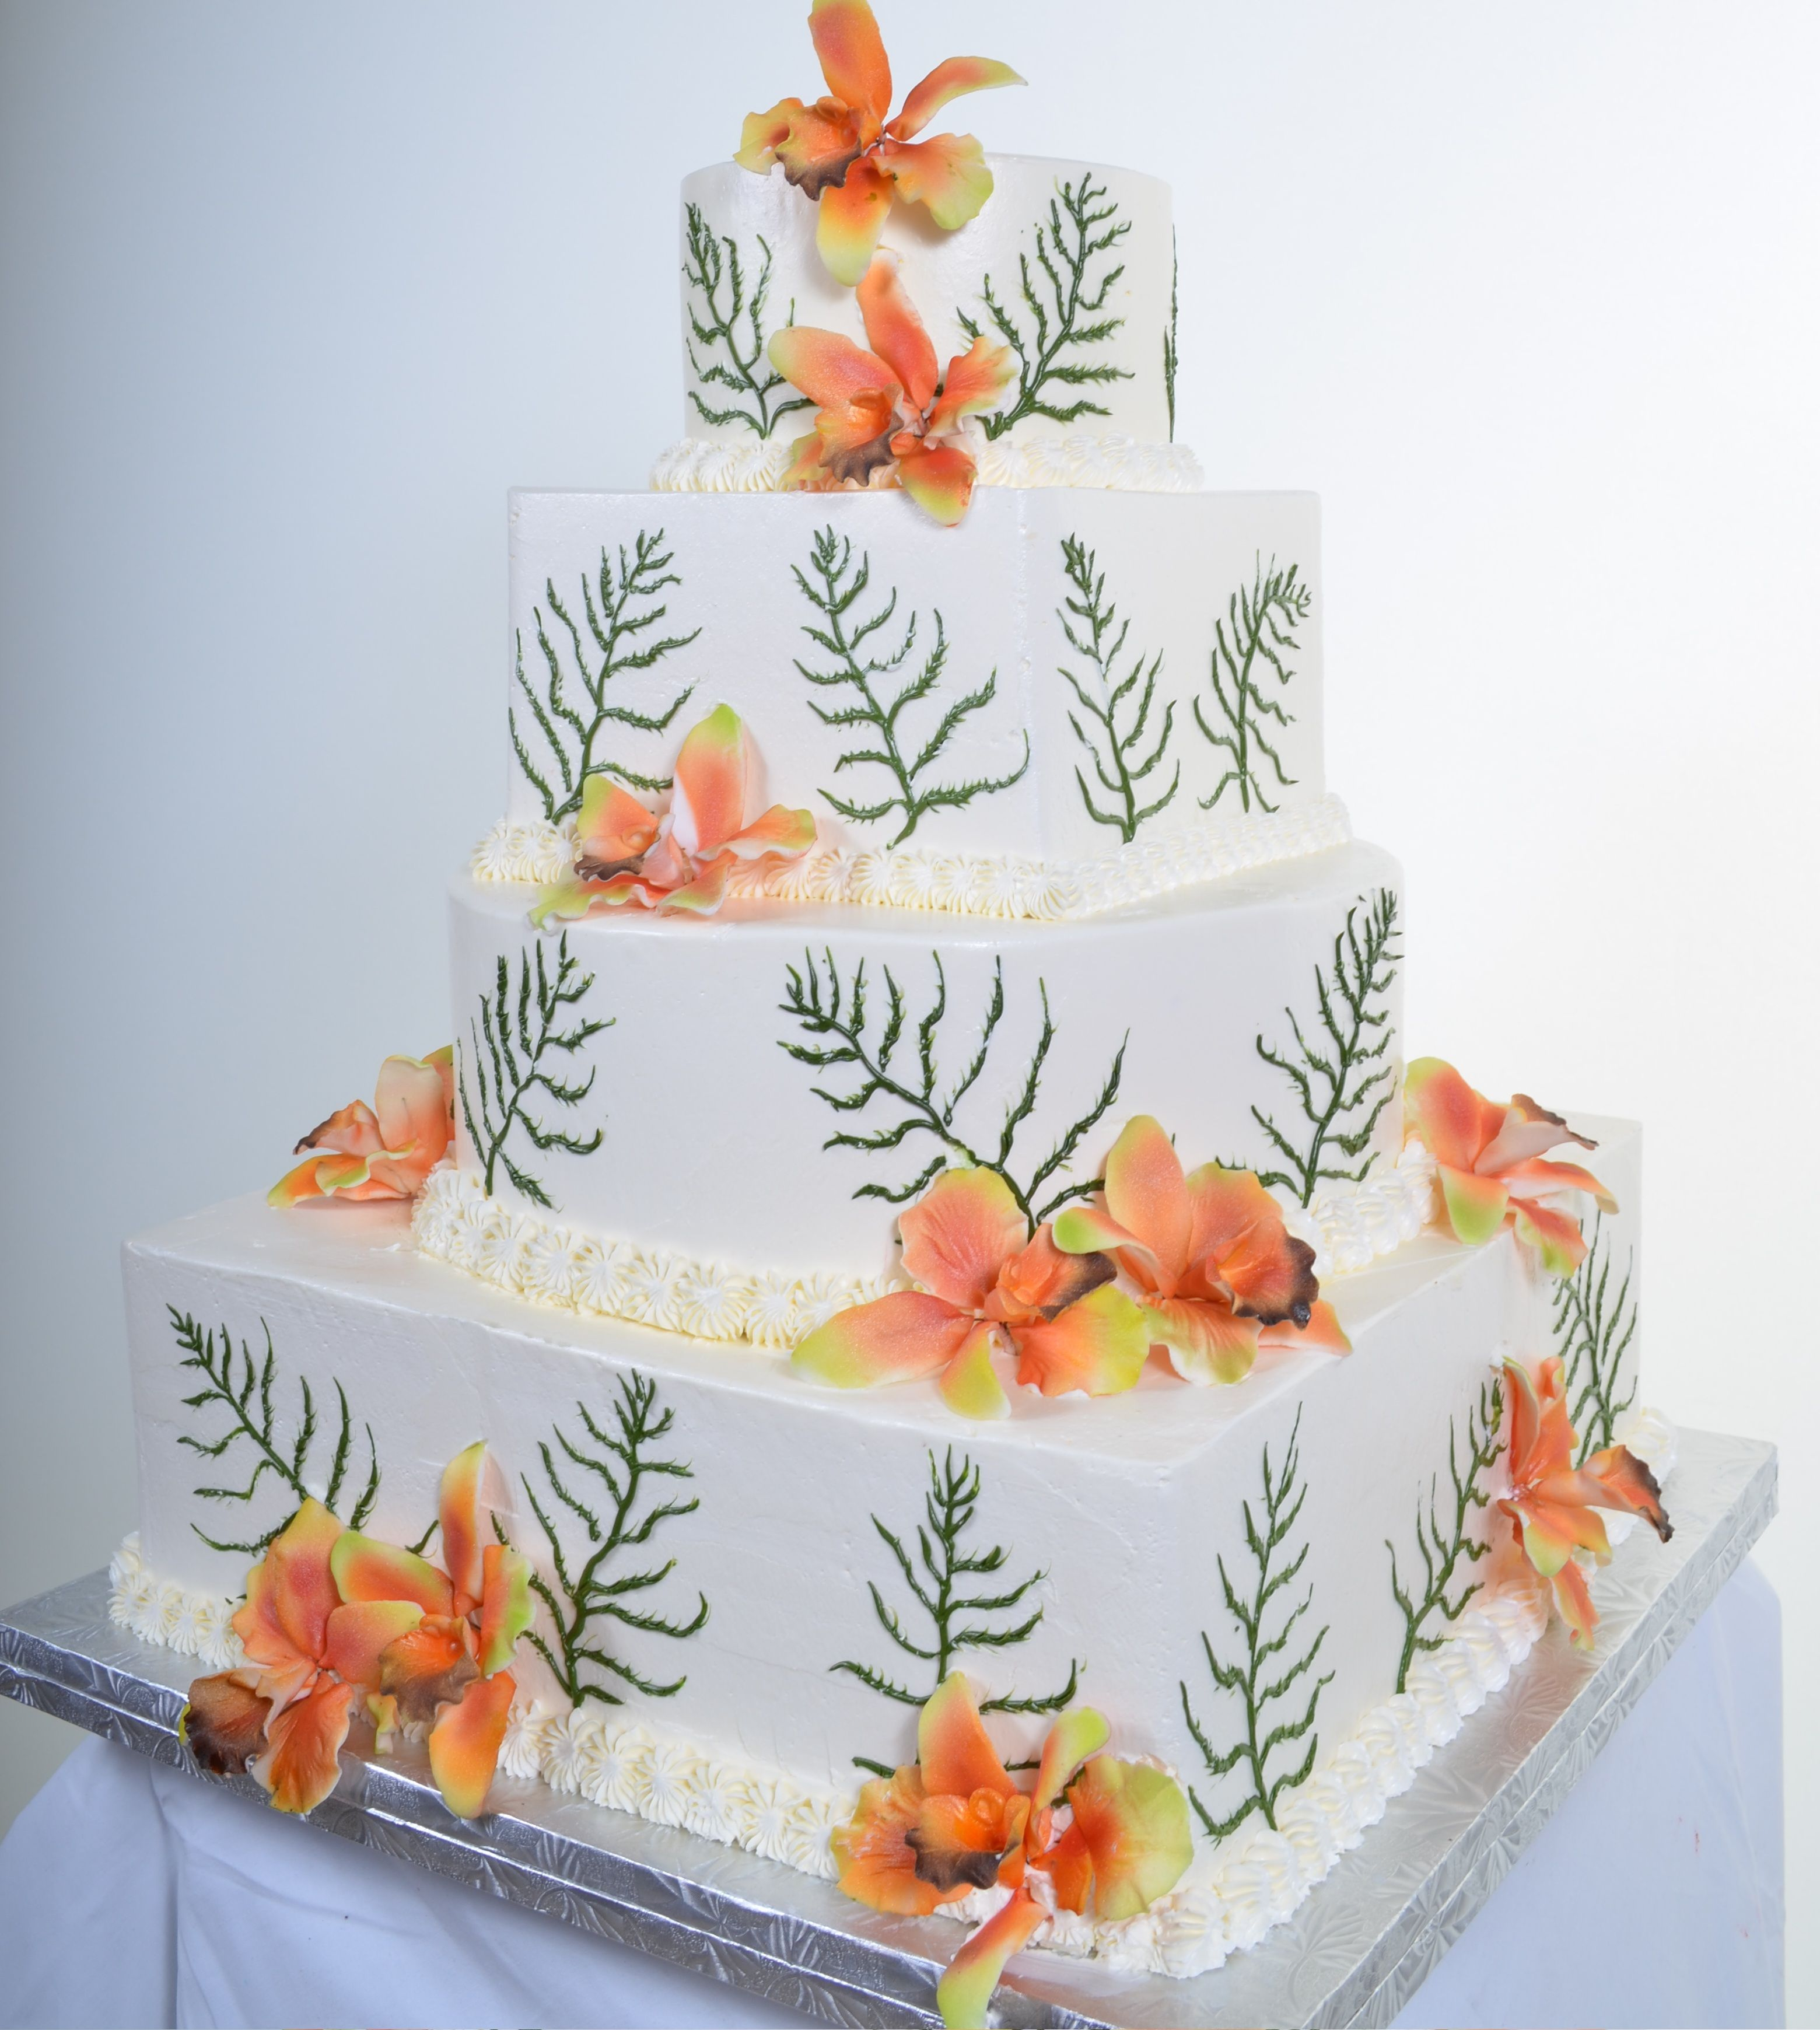 Orchids & Greens Vegas cake, Cupcake cakes, Las vegas